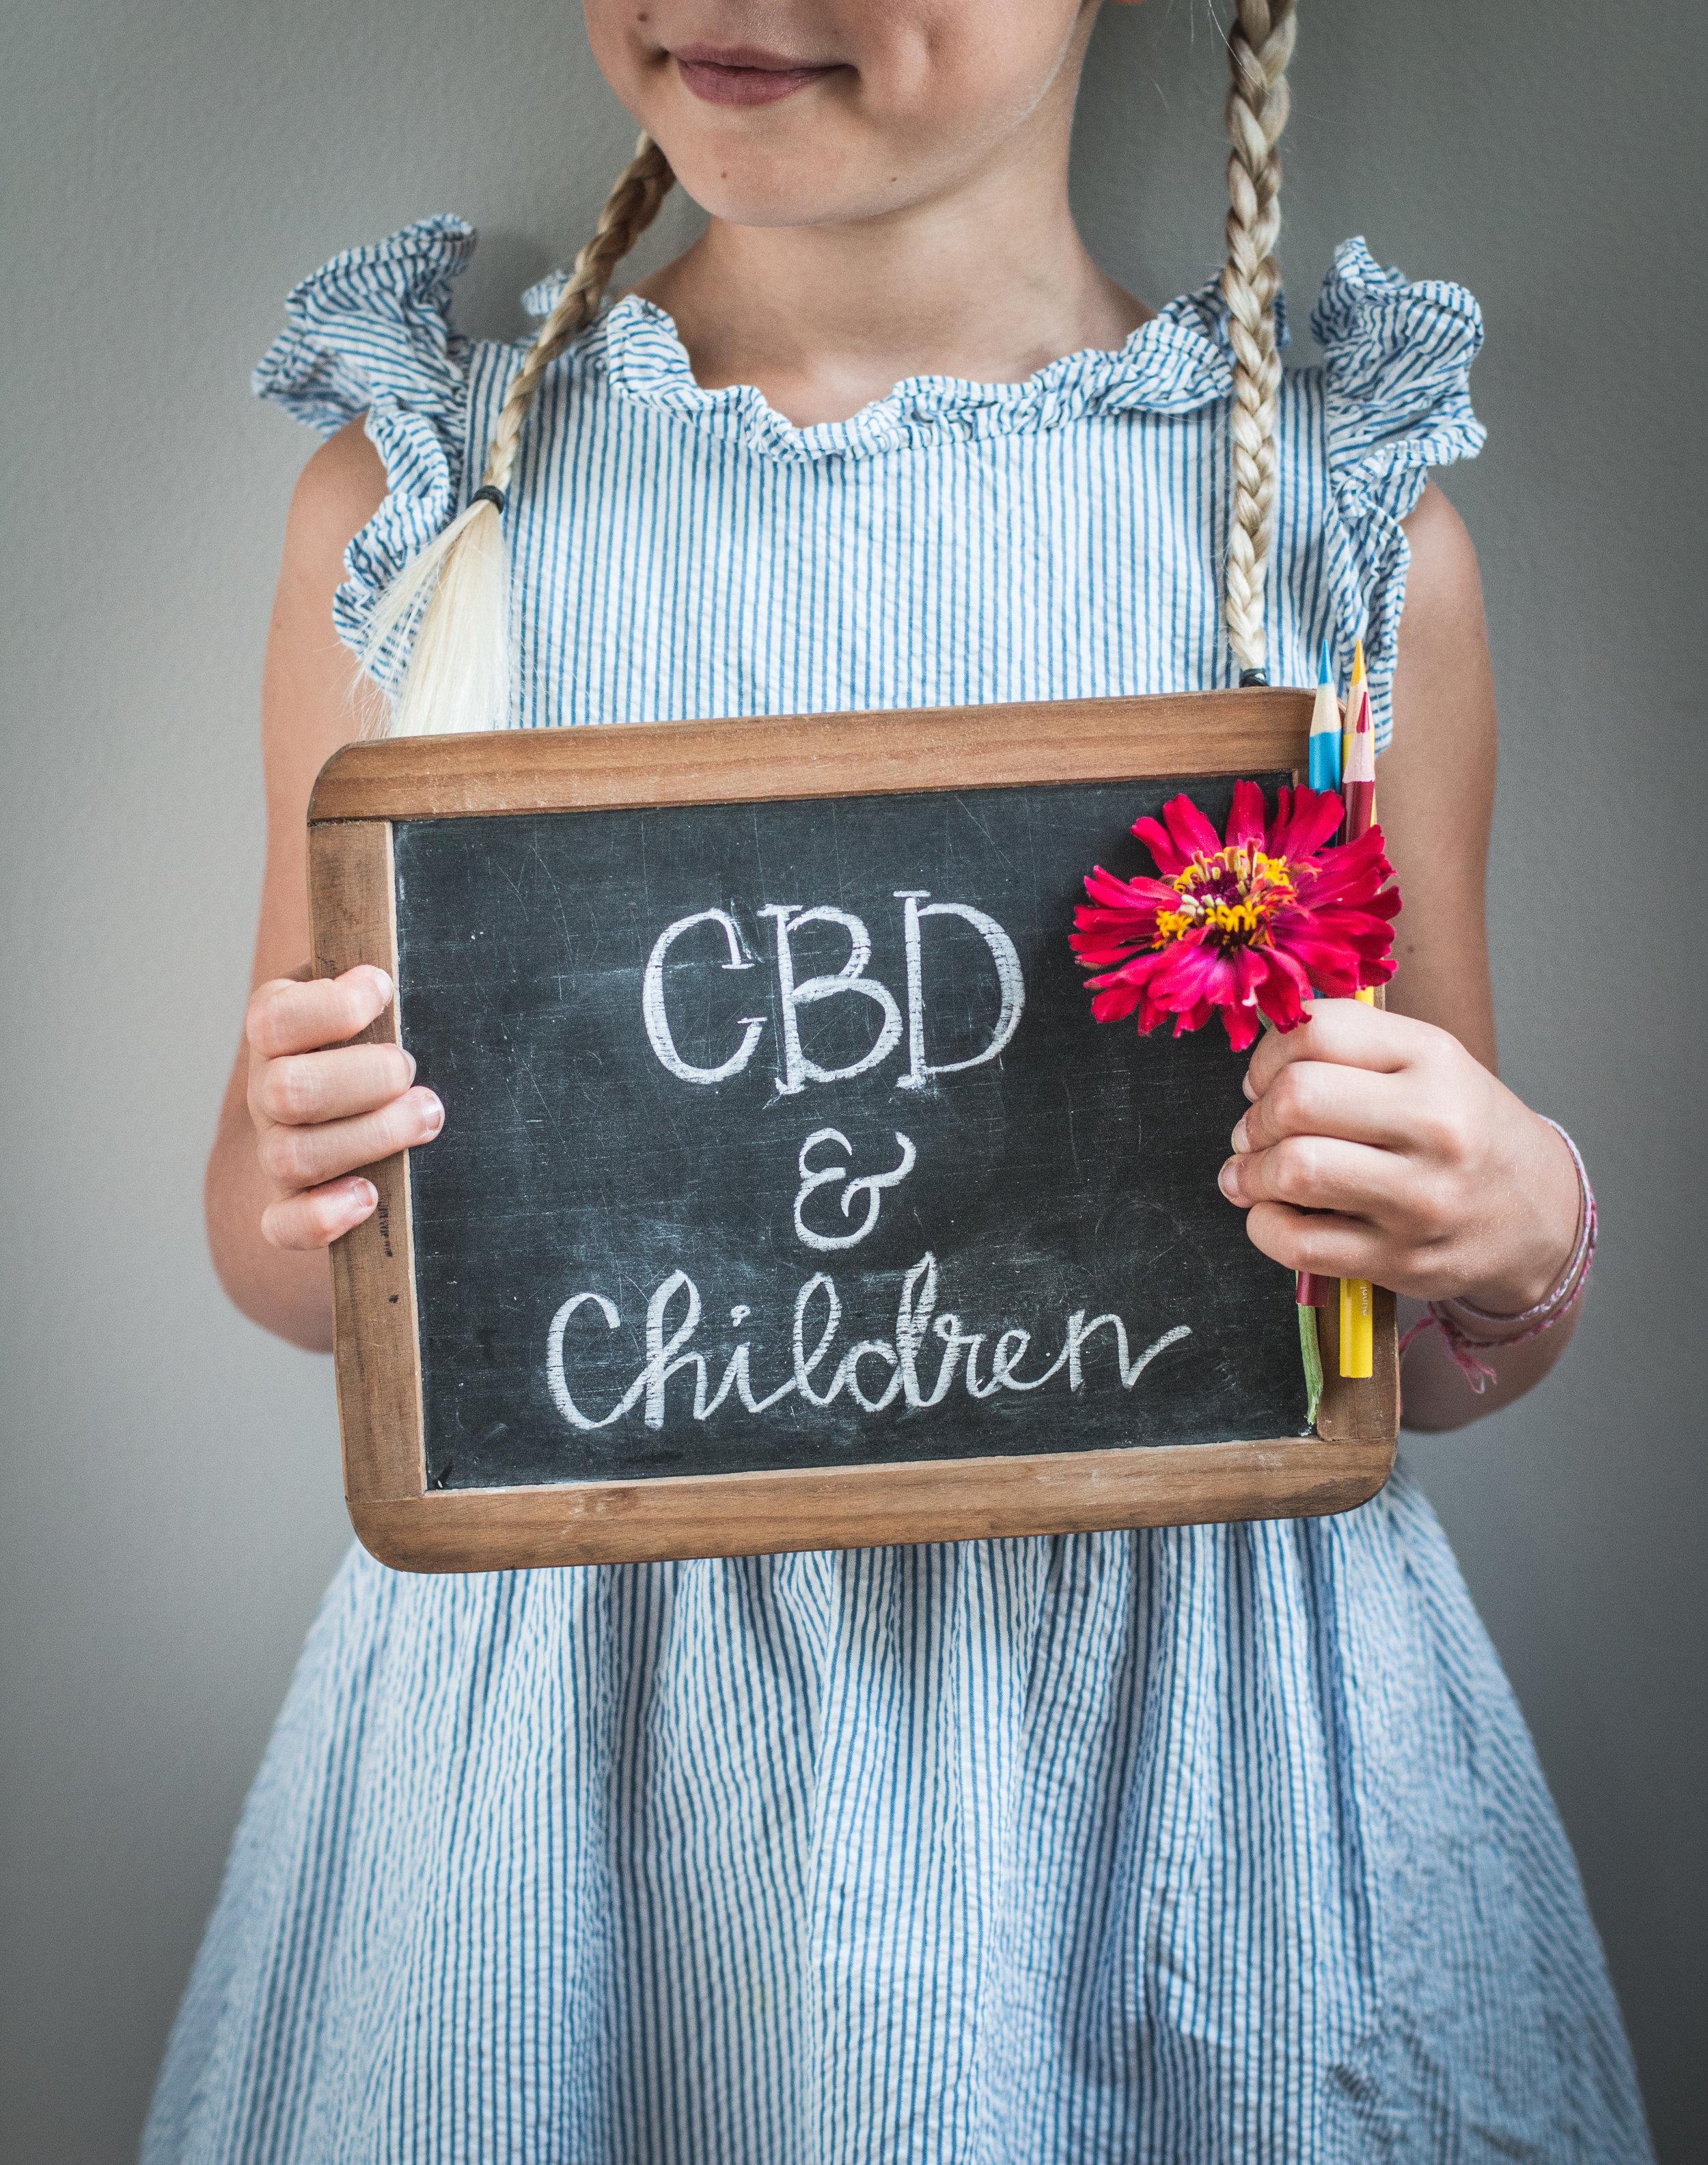 CBDD & children 2.jpeg